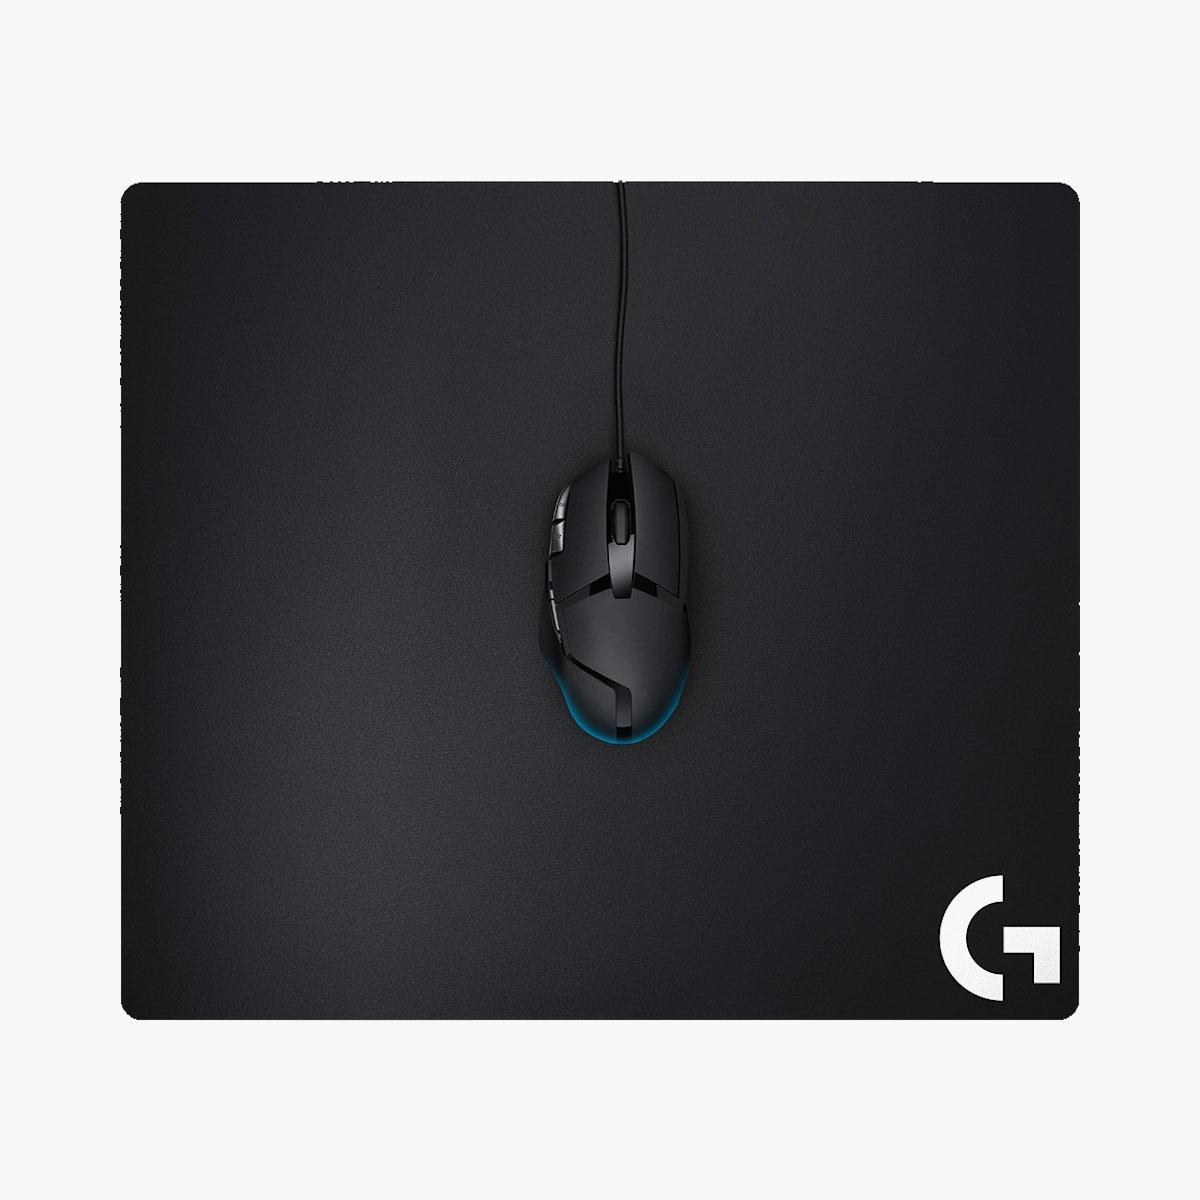 G640 Large Cloth Gaming Mousepad